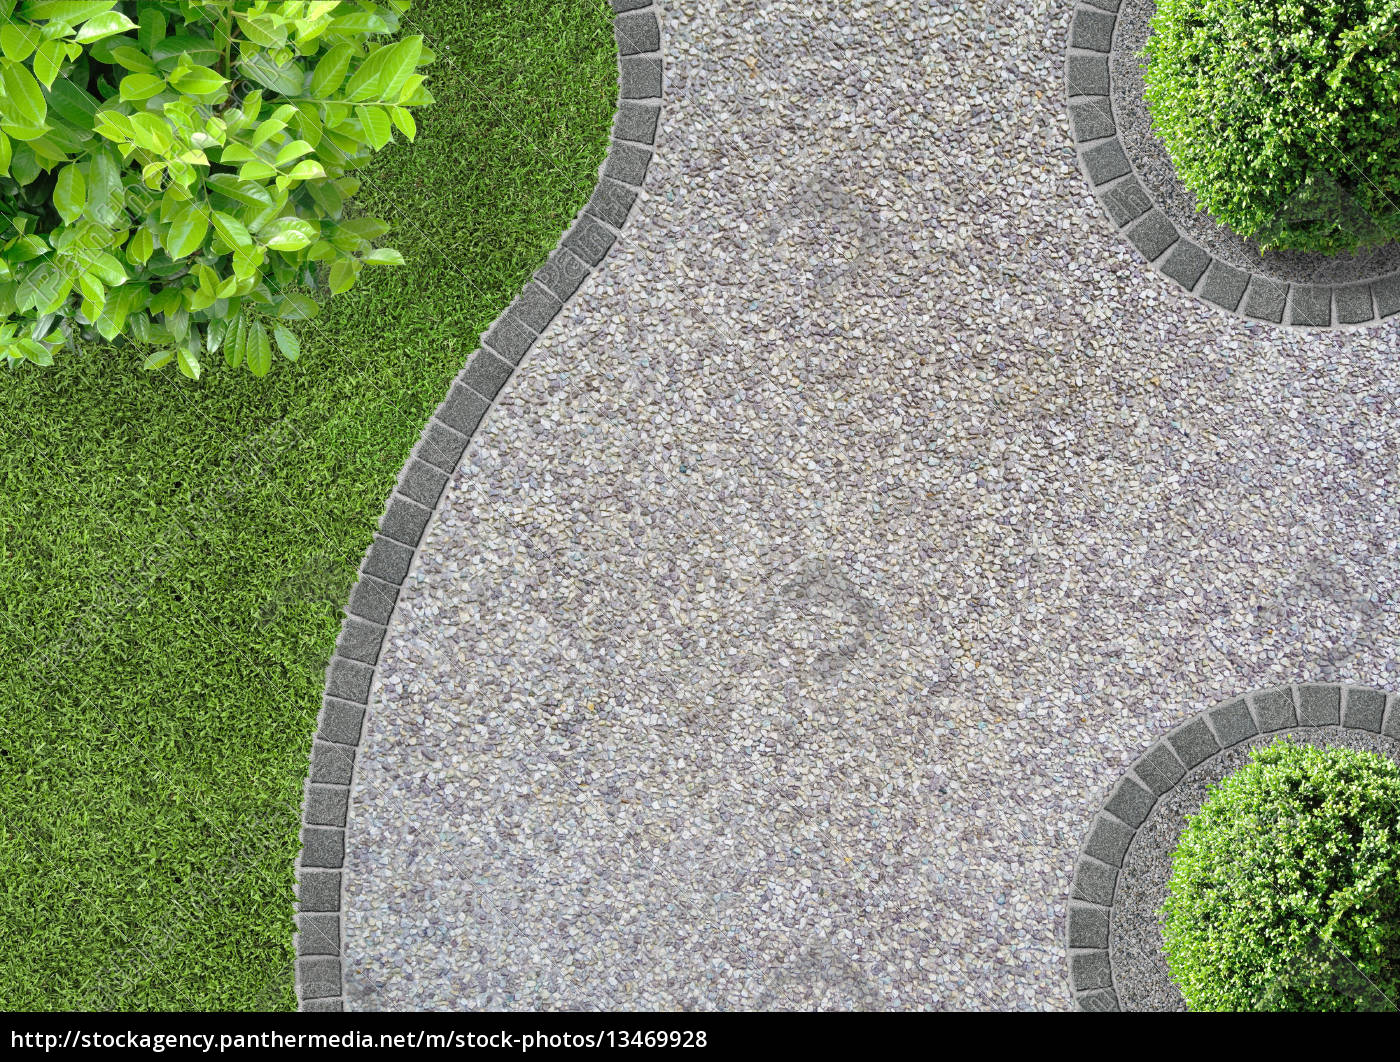 gartenwege anlegen – ideen für den kiesweg im garten – actof, Garten ideen